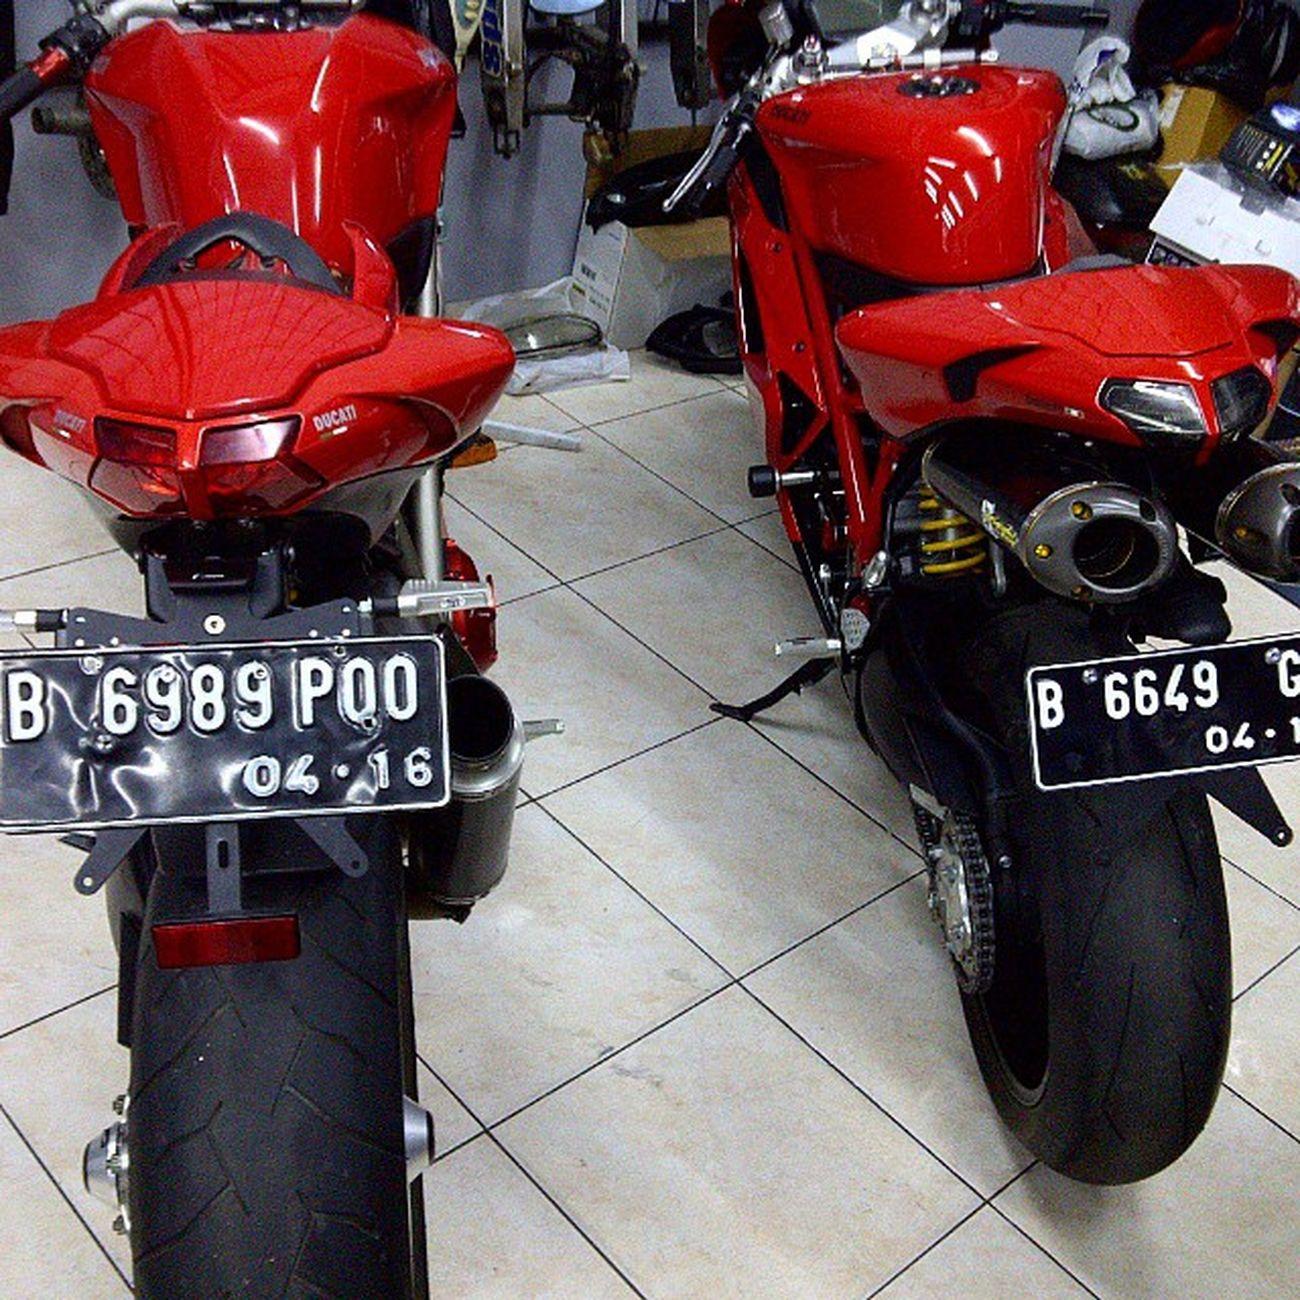 Ducati Ducatisti Ducatista Ducatistreetfighter S 1098 Ducati848 848 Rizoma Ohlins Brembo  Pirelli Italia @ducatisofinstagram